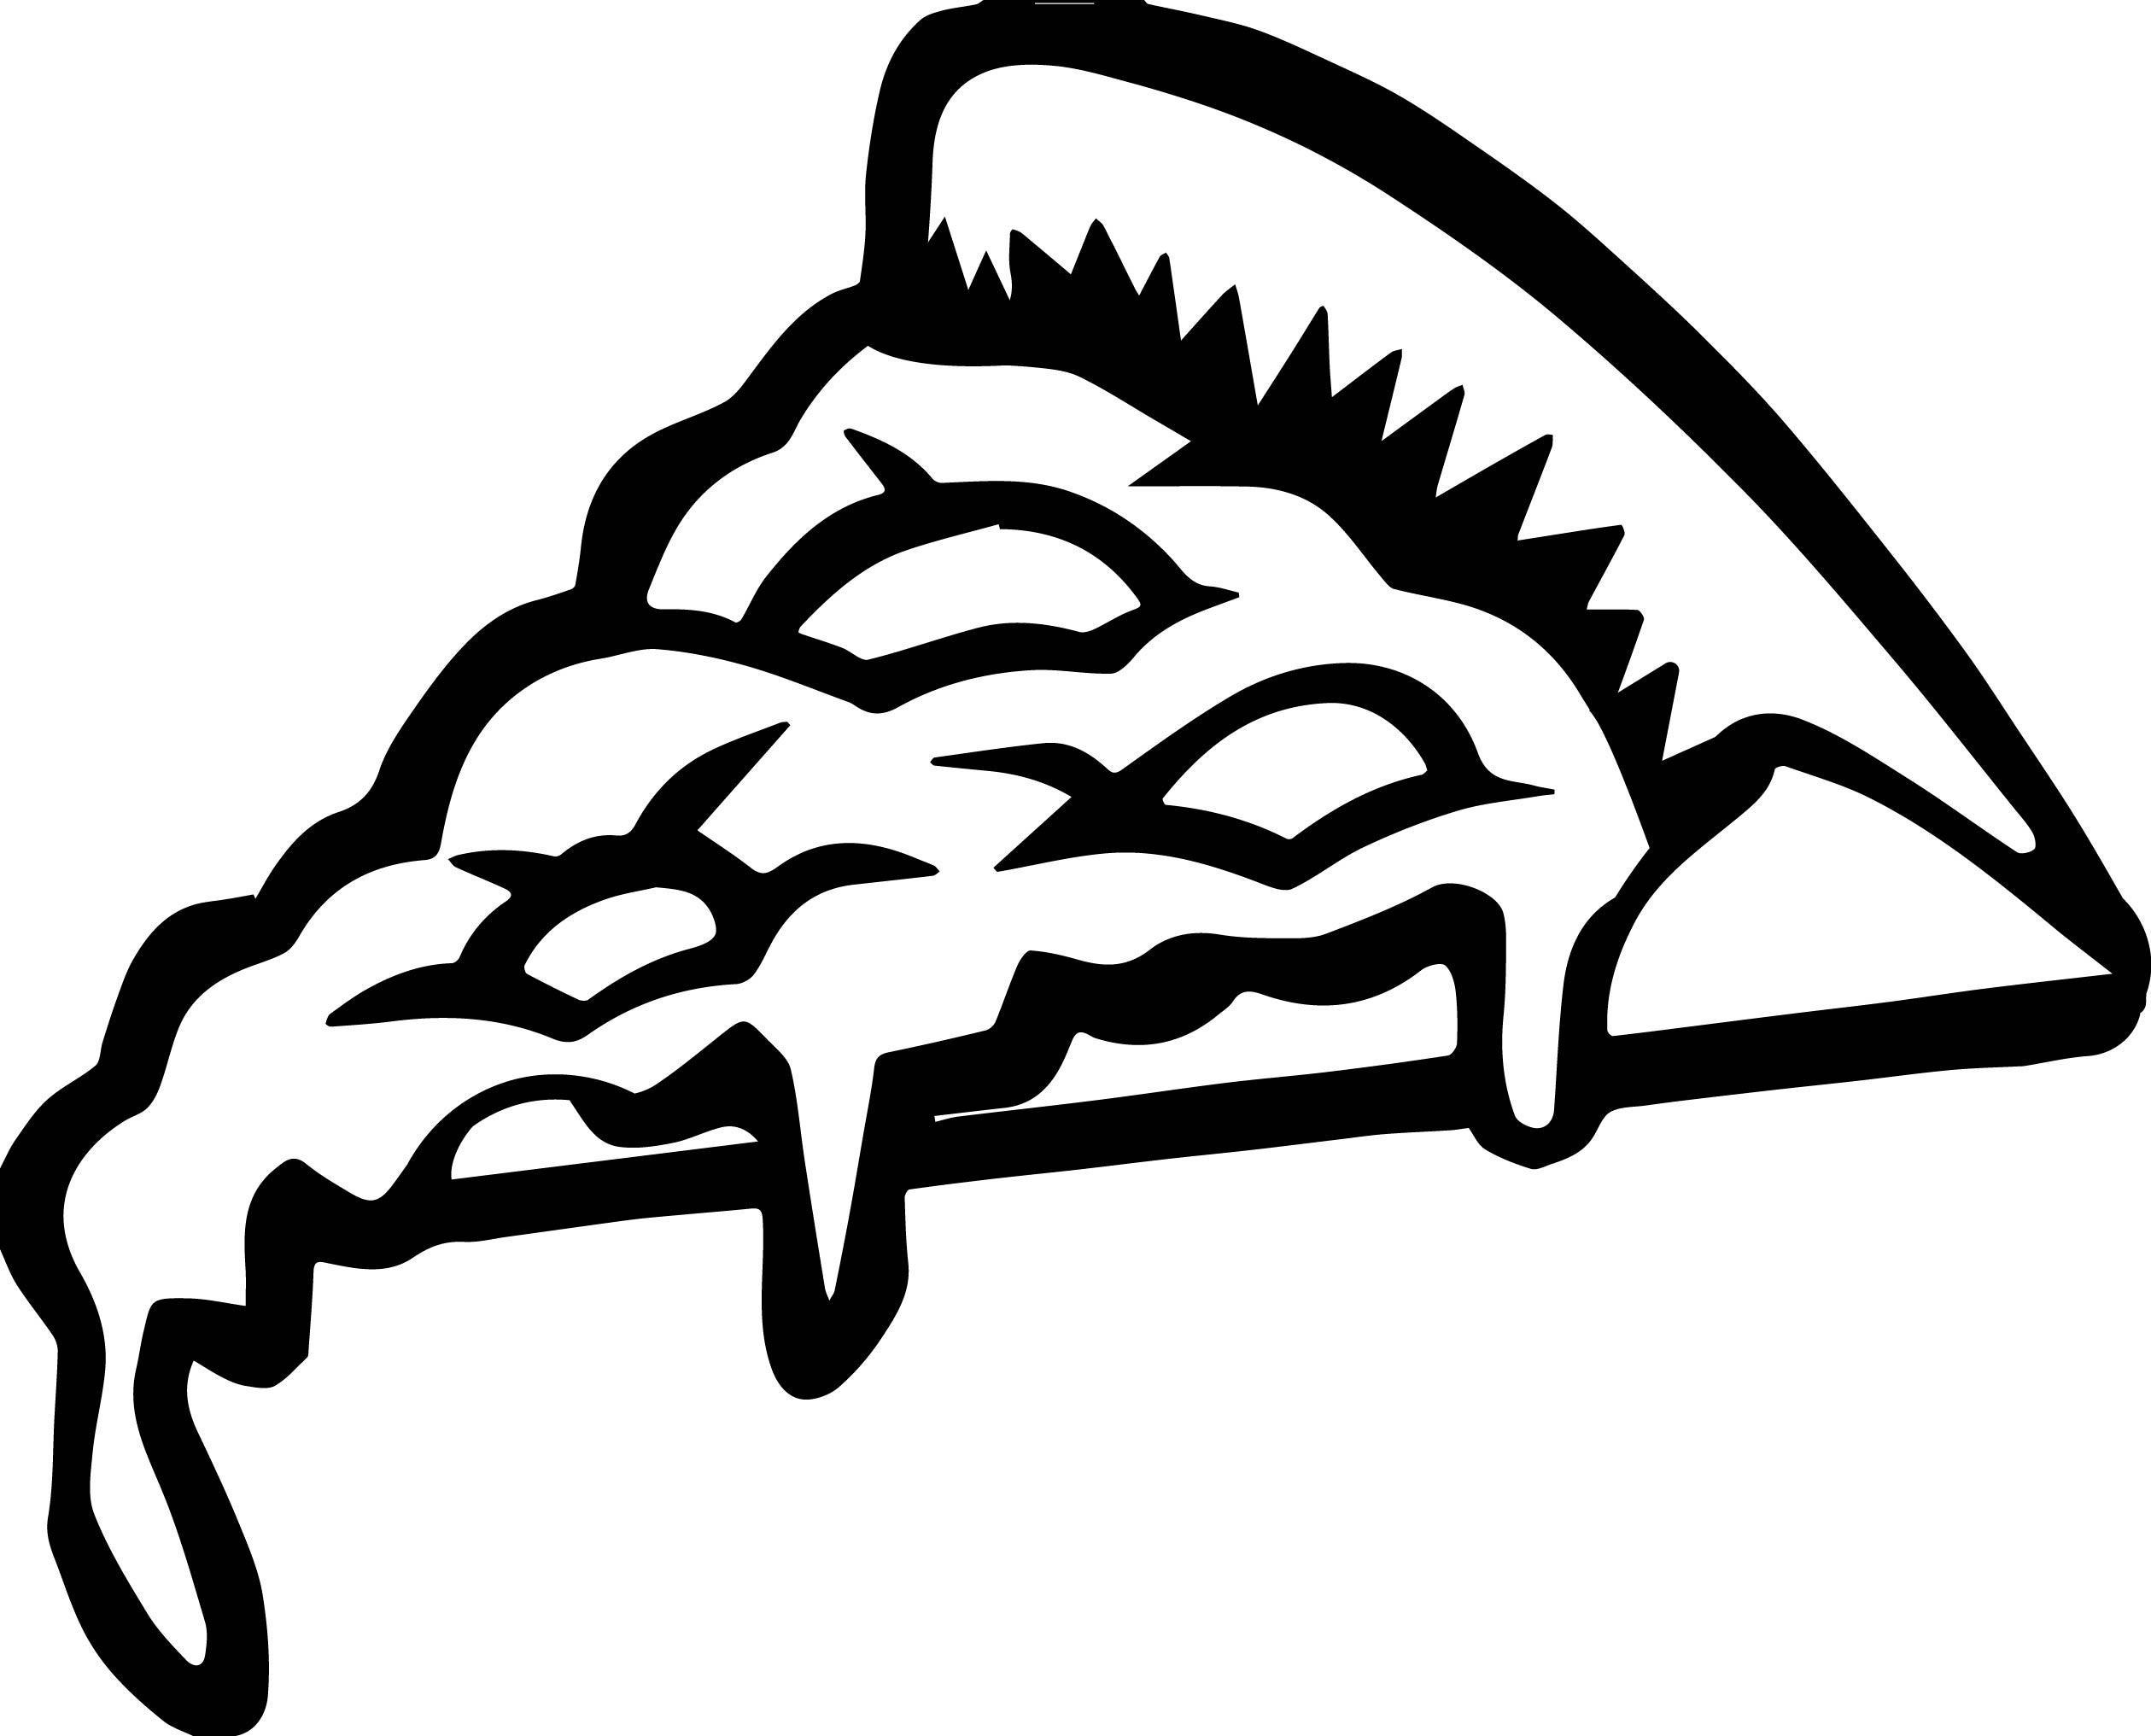 Whole Pizza Half Pizza Pizza Slice Dripping Cheese